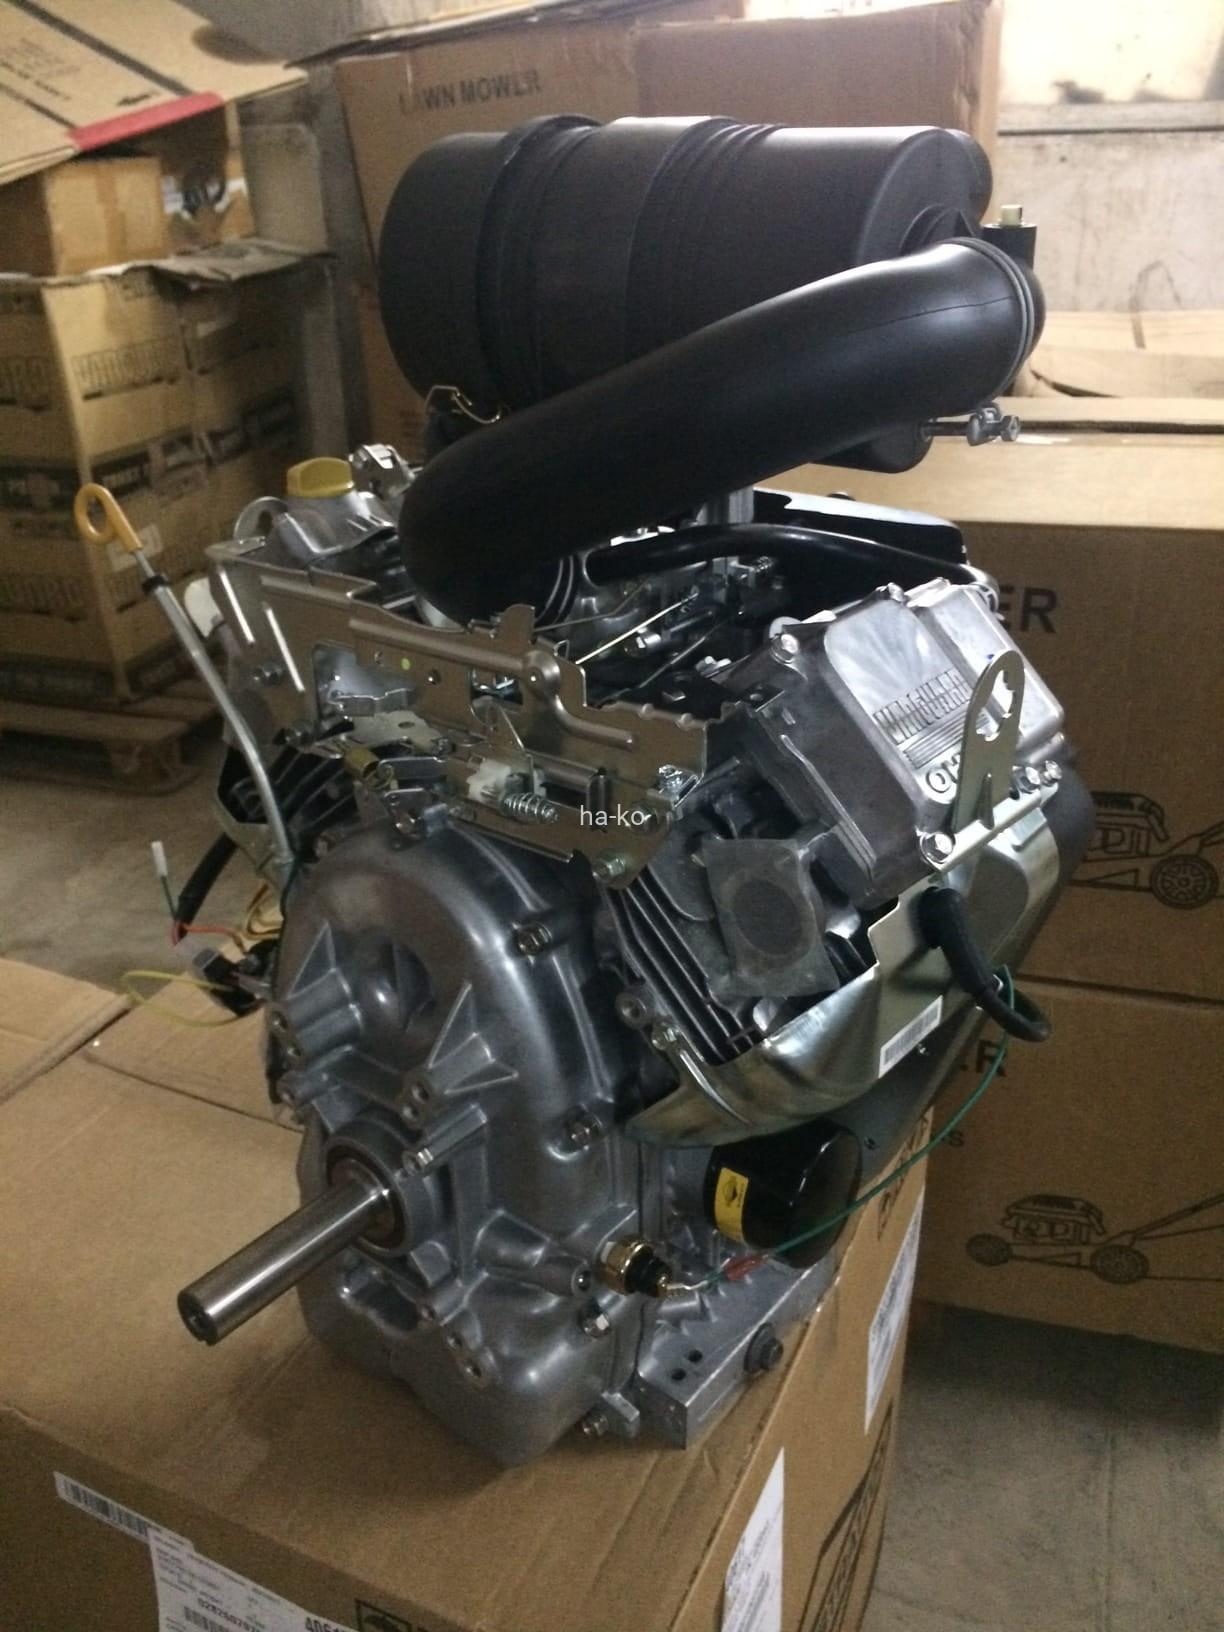 Briggs & stratton Vanguard 31hp vtwin petrol engine